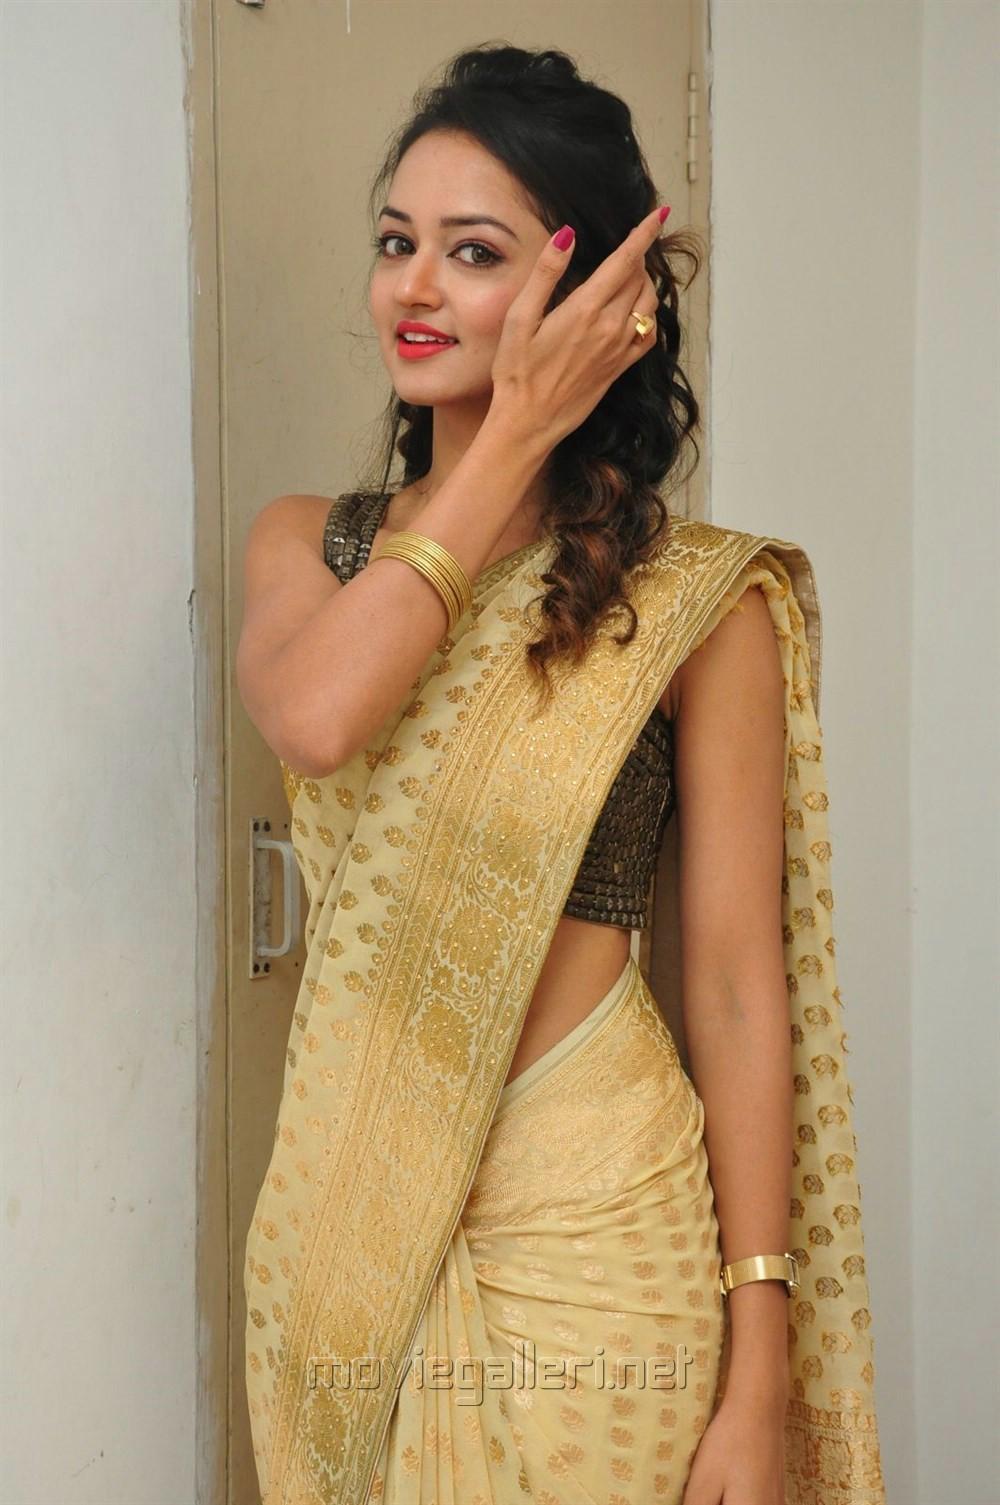 Shanvi Cute Hd Wallpapers Picture 884005 Actress Shanvi Srivastava In Golden Color